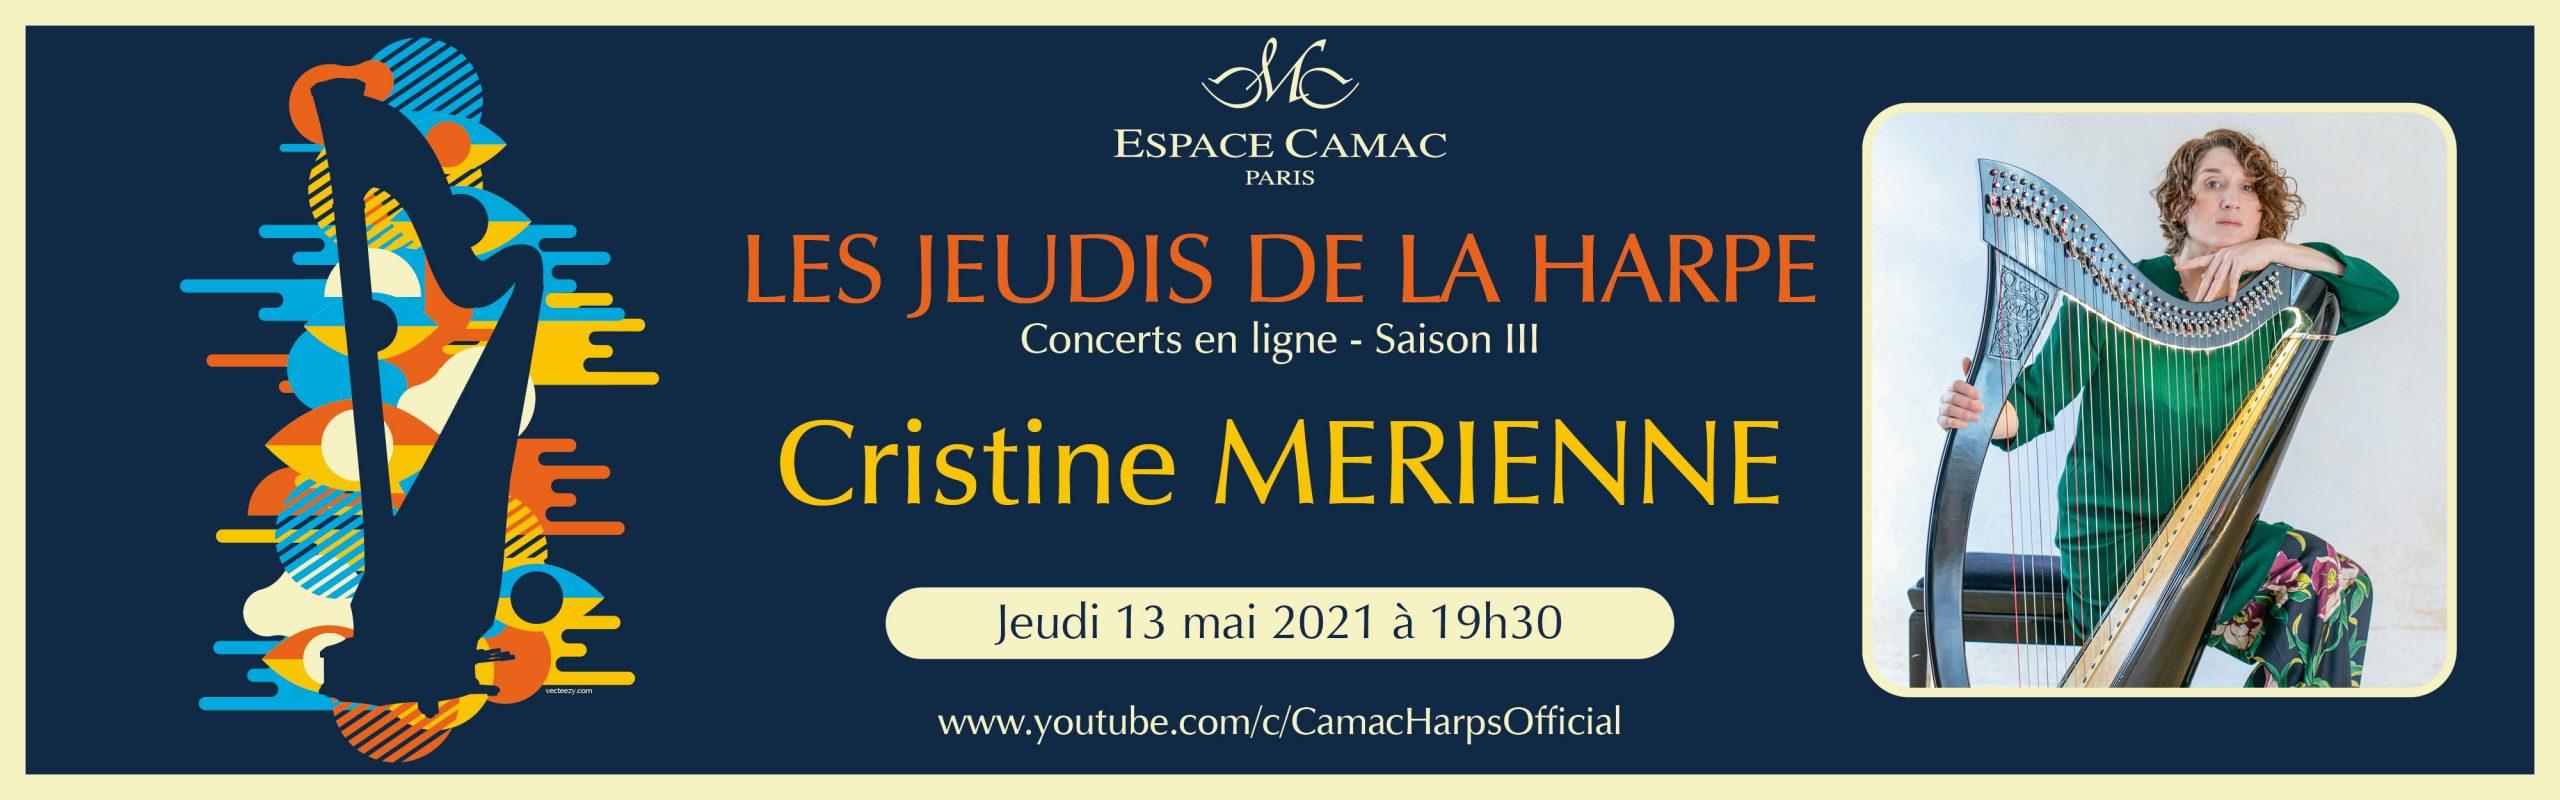 Les Jeudis de la Harpe : Cristine Merienne